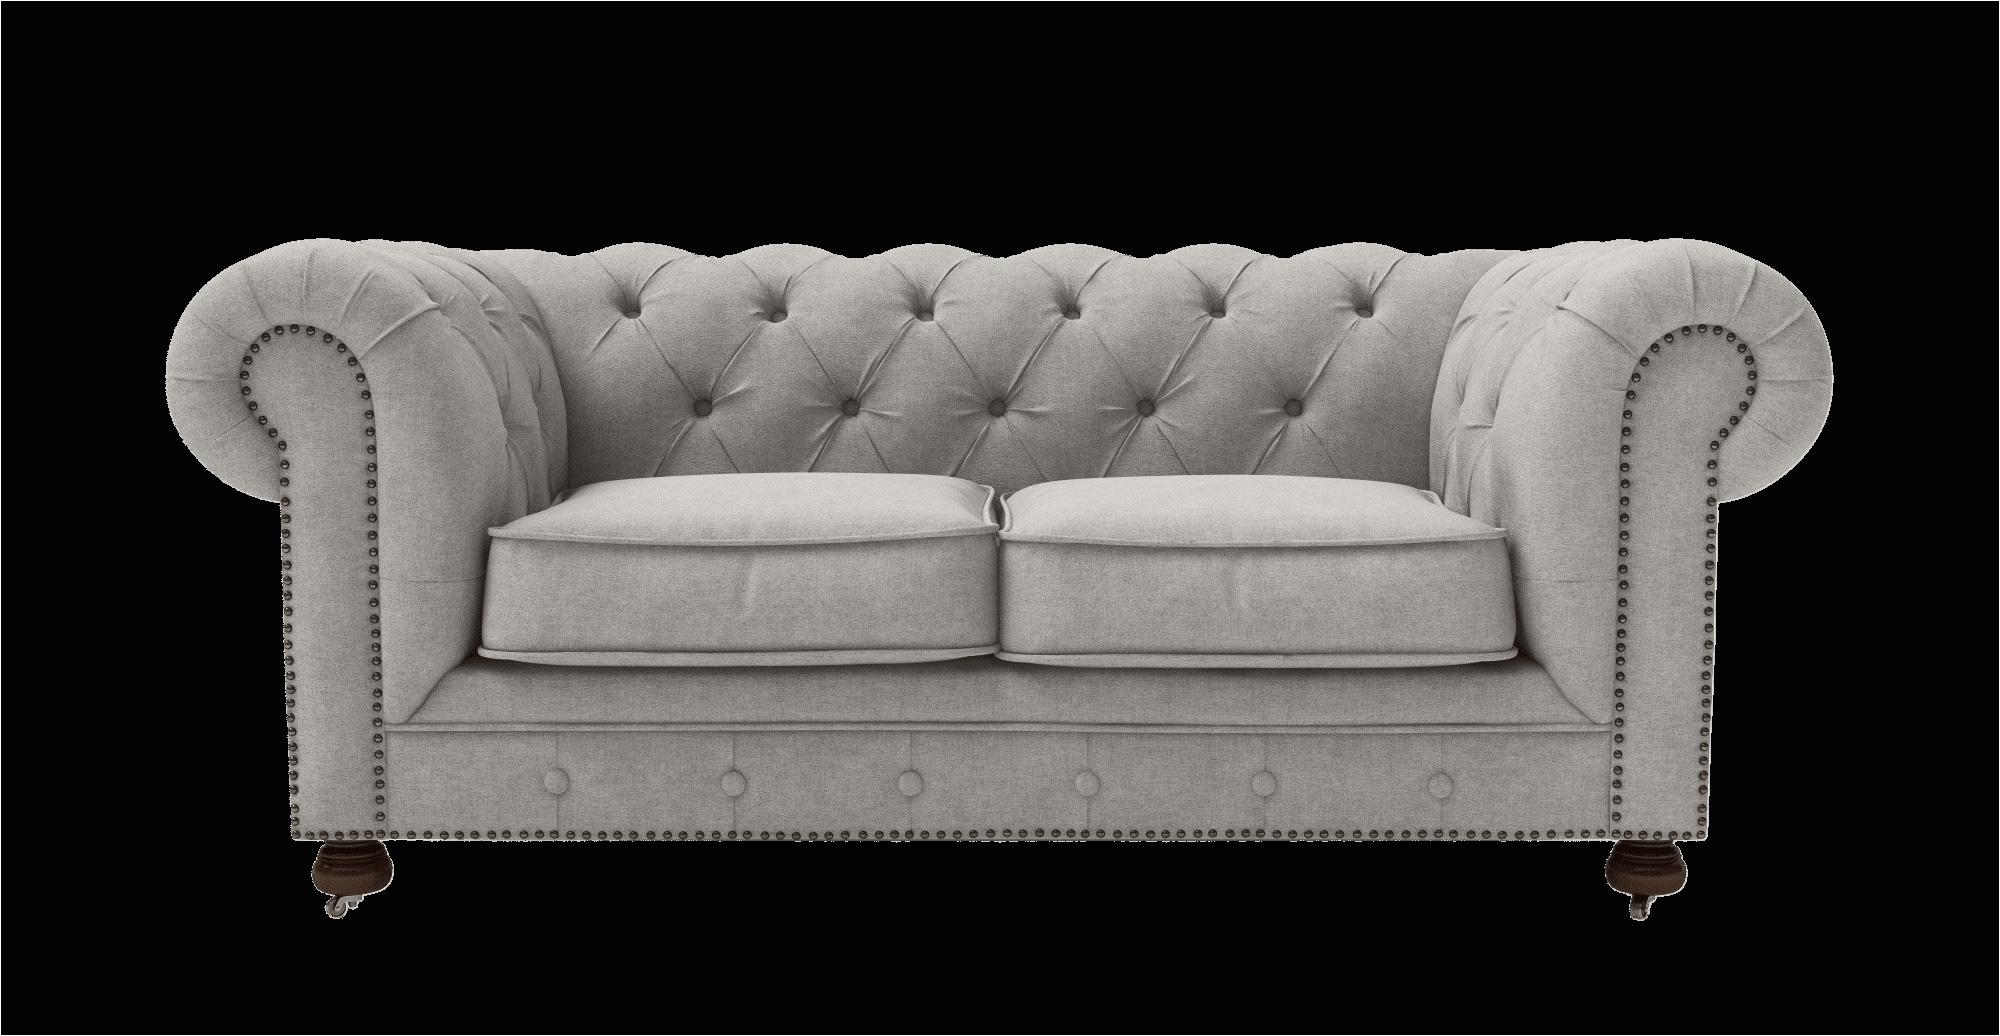 american freight furniture louisville ky best of american freight furniture and mattress indianapolis in best 50